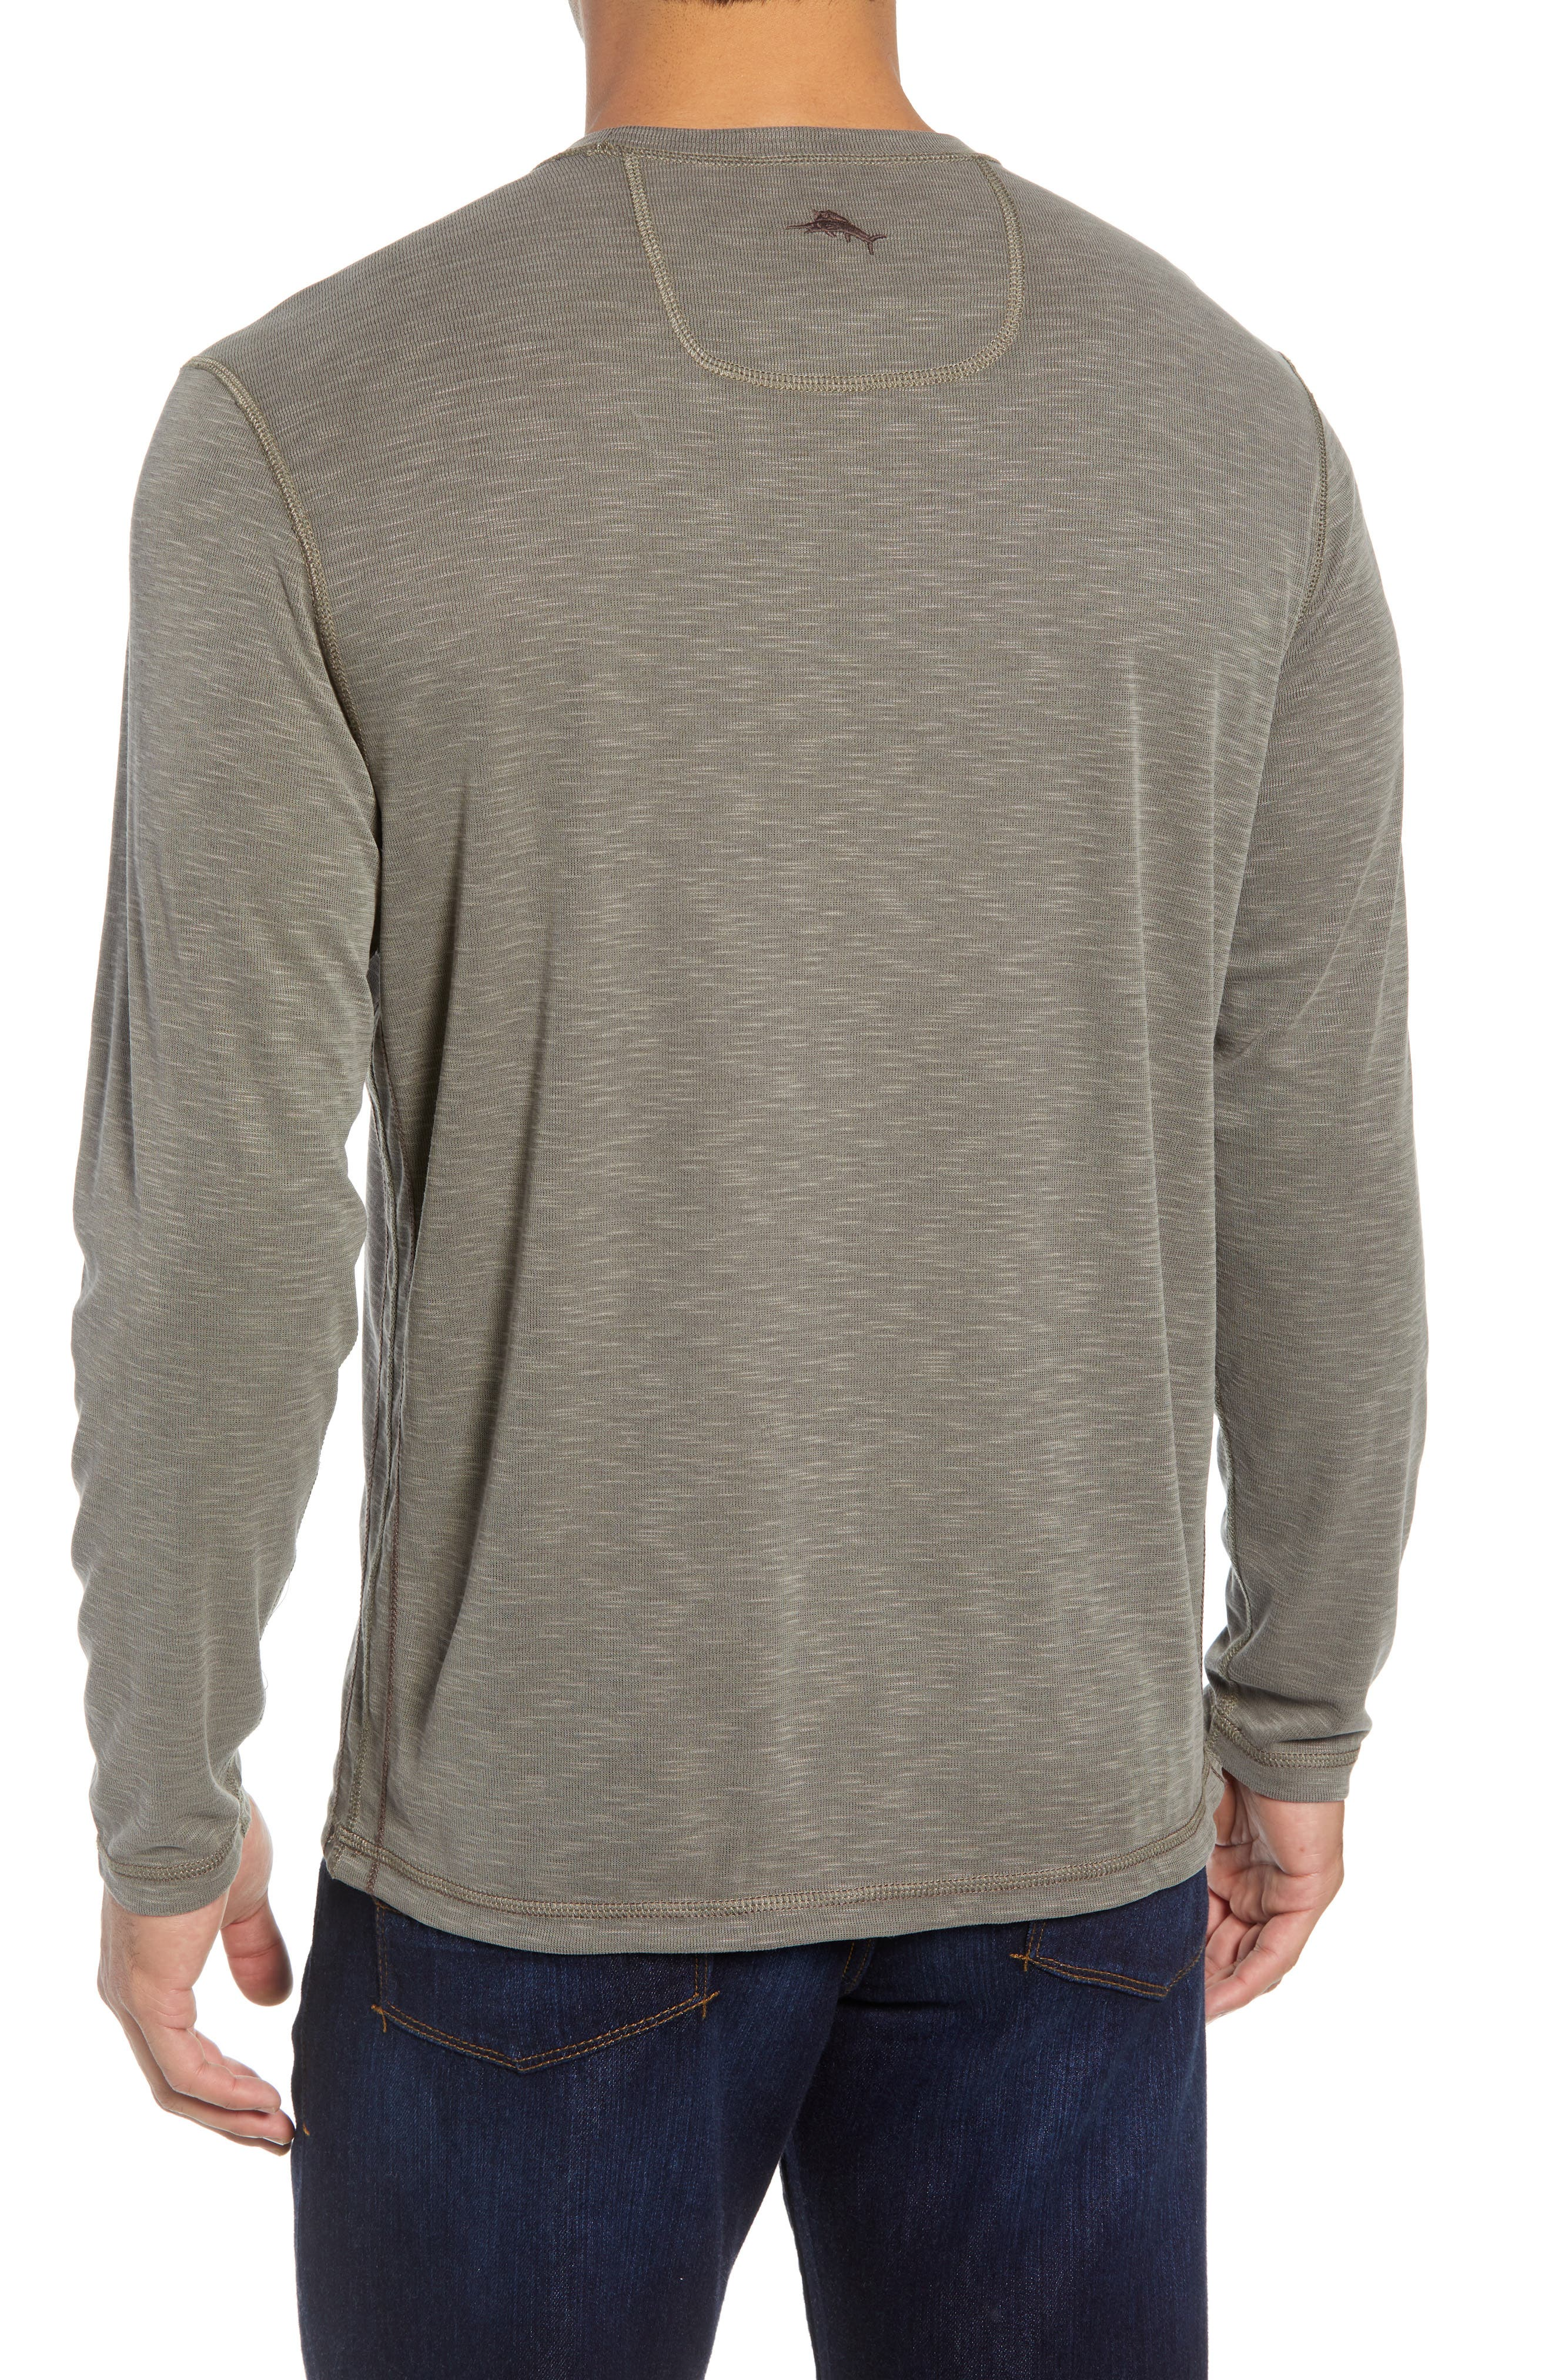 Flip Tide Standard Fit T-Shirt,                             Alternate thumbnail 3, color,                             BITTERSWEET CHOCOLATE